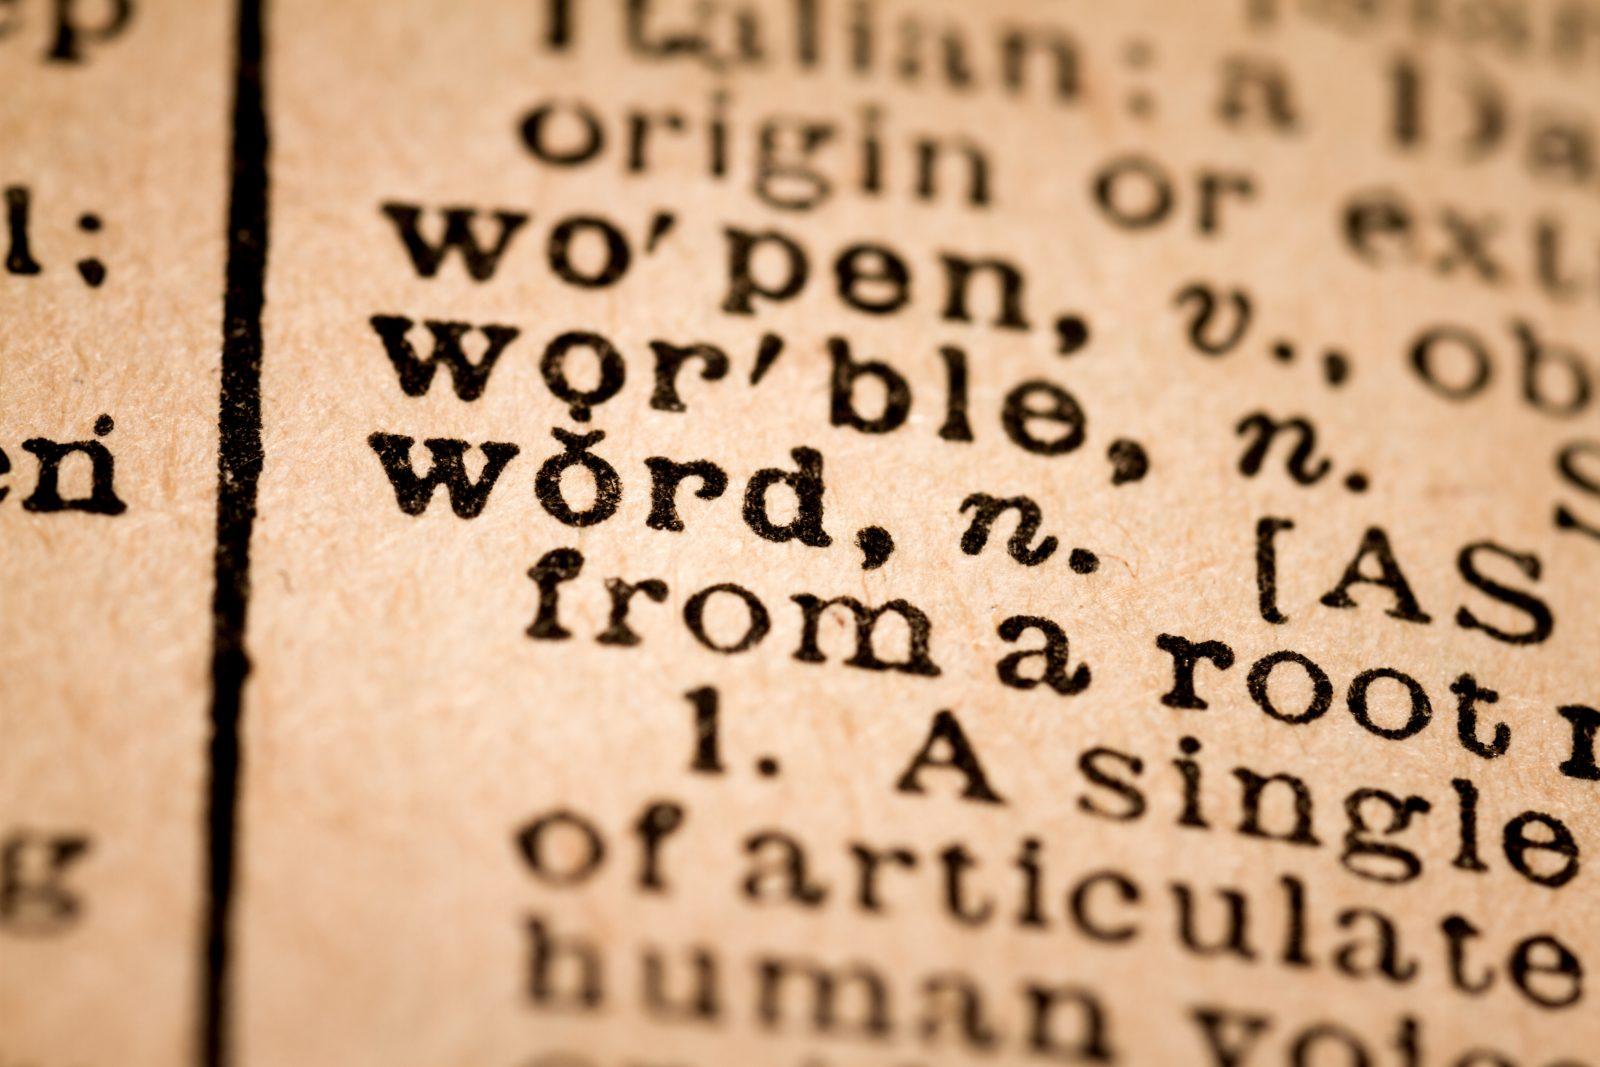 [object object] - Le parole chiave giuste - Le parole chiave giuste